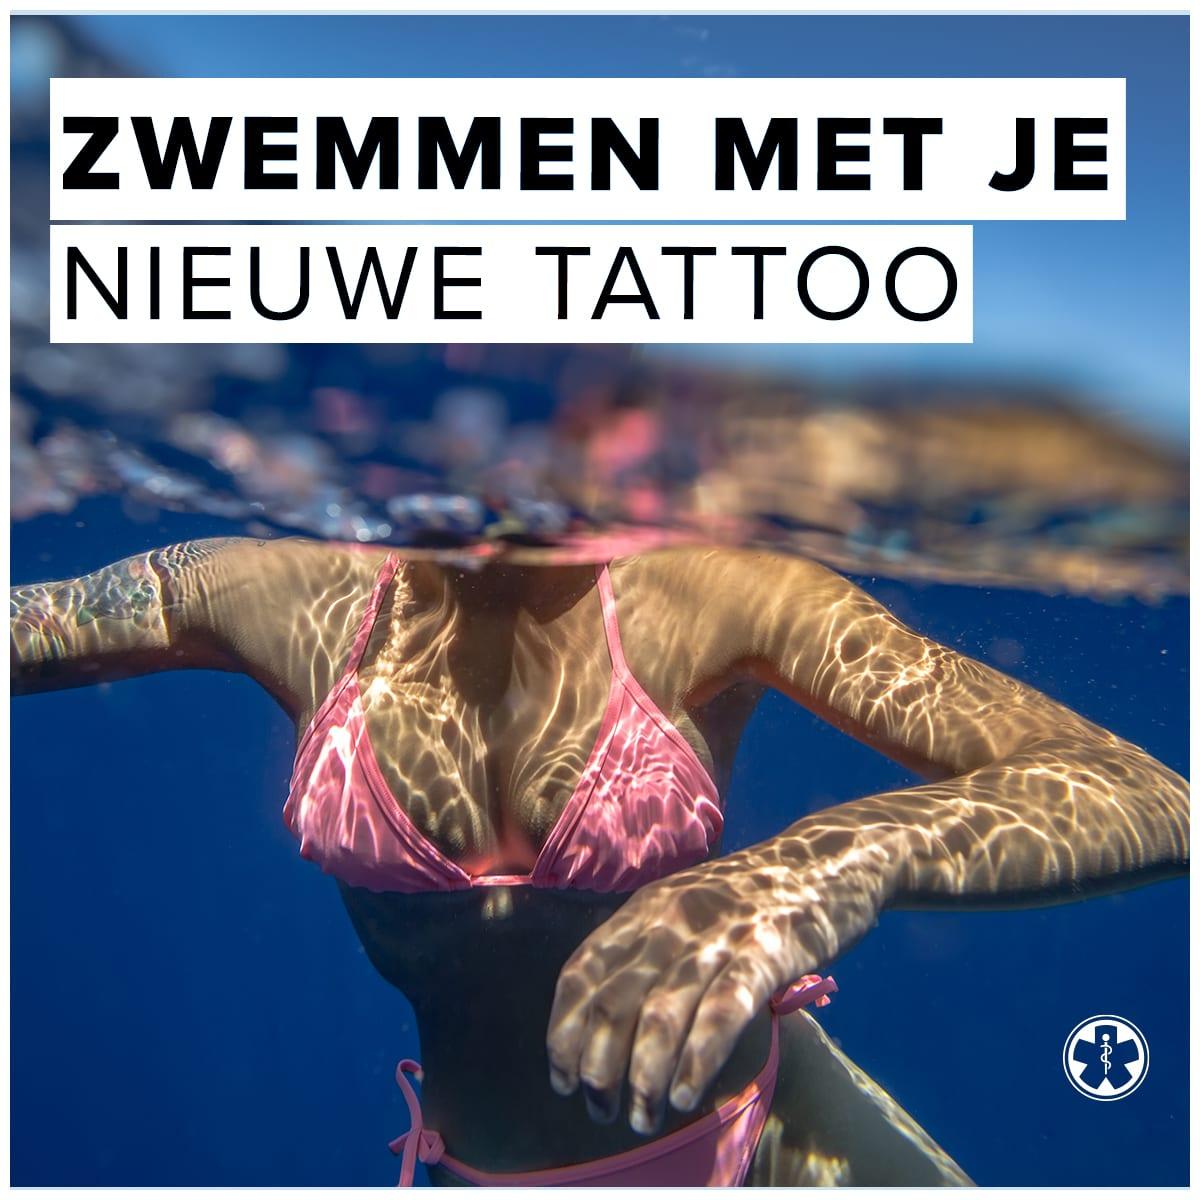 Tattoo nazorg | verzorging zwemmen met je nieuwe tattoo